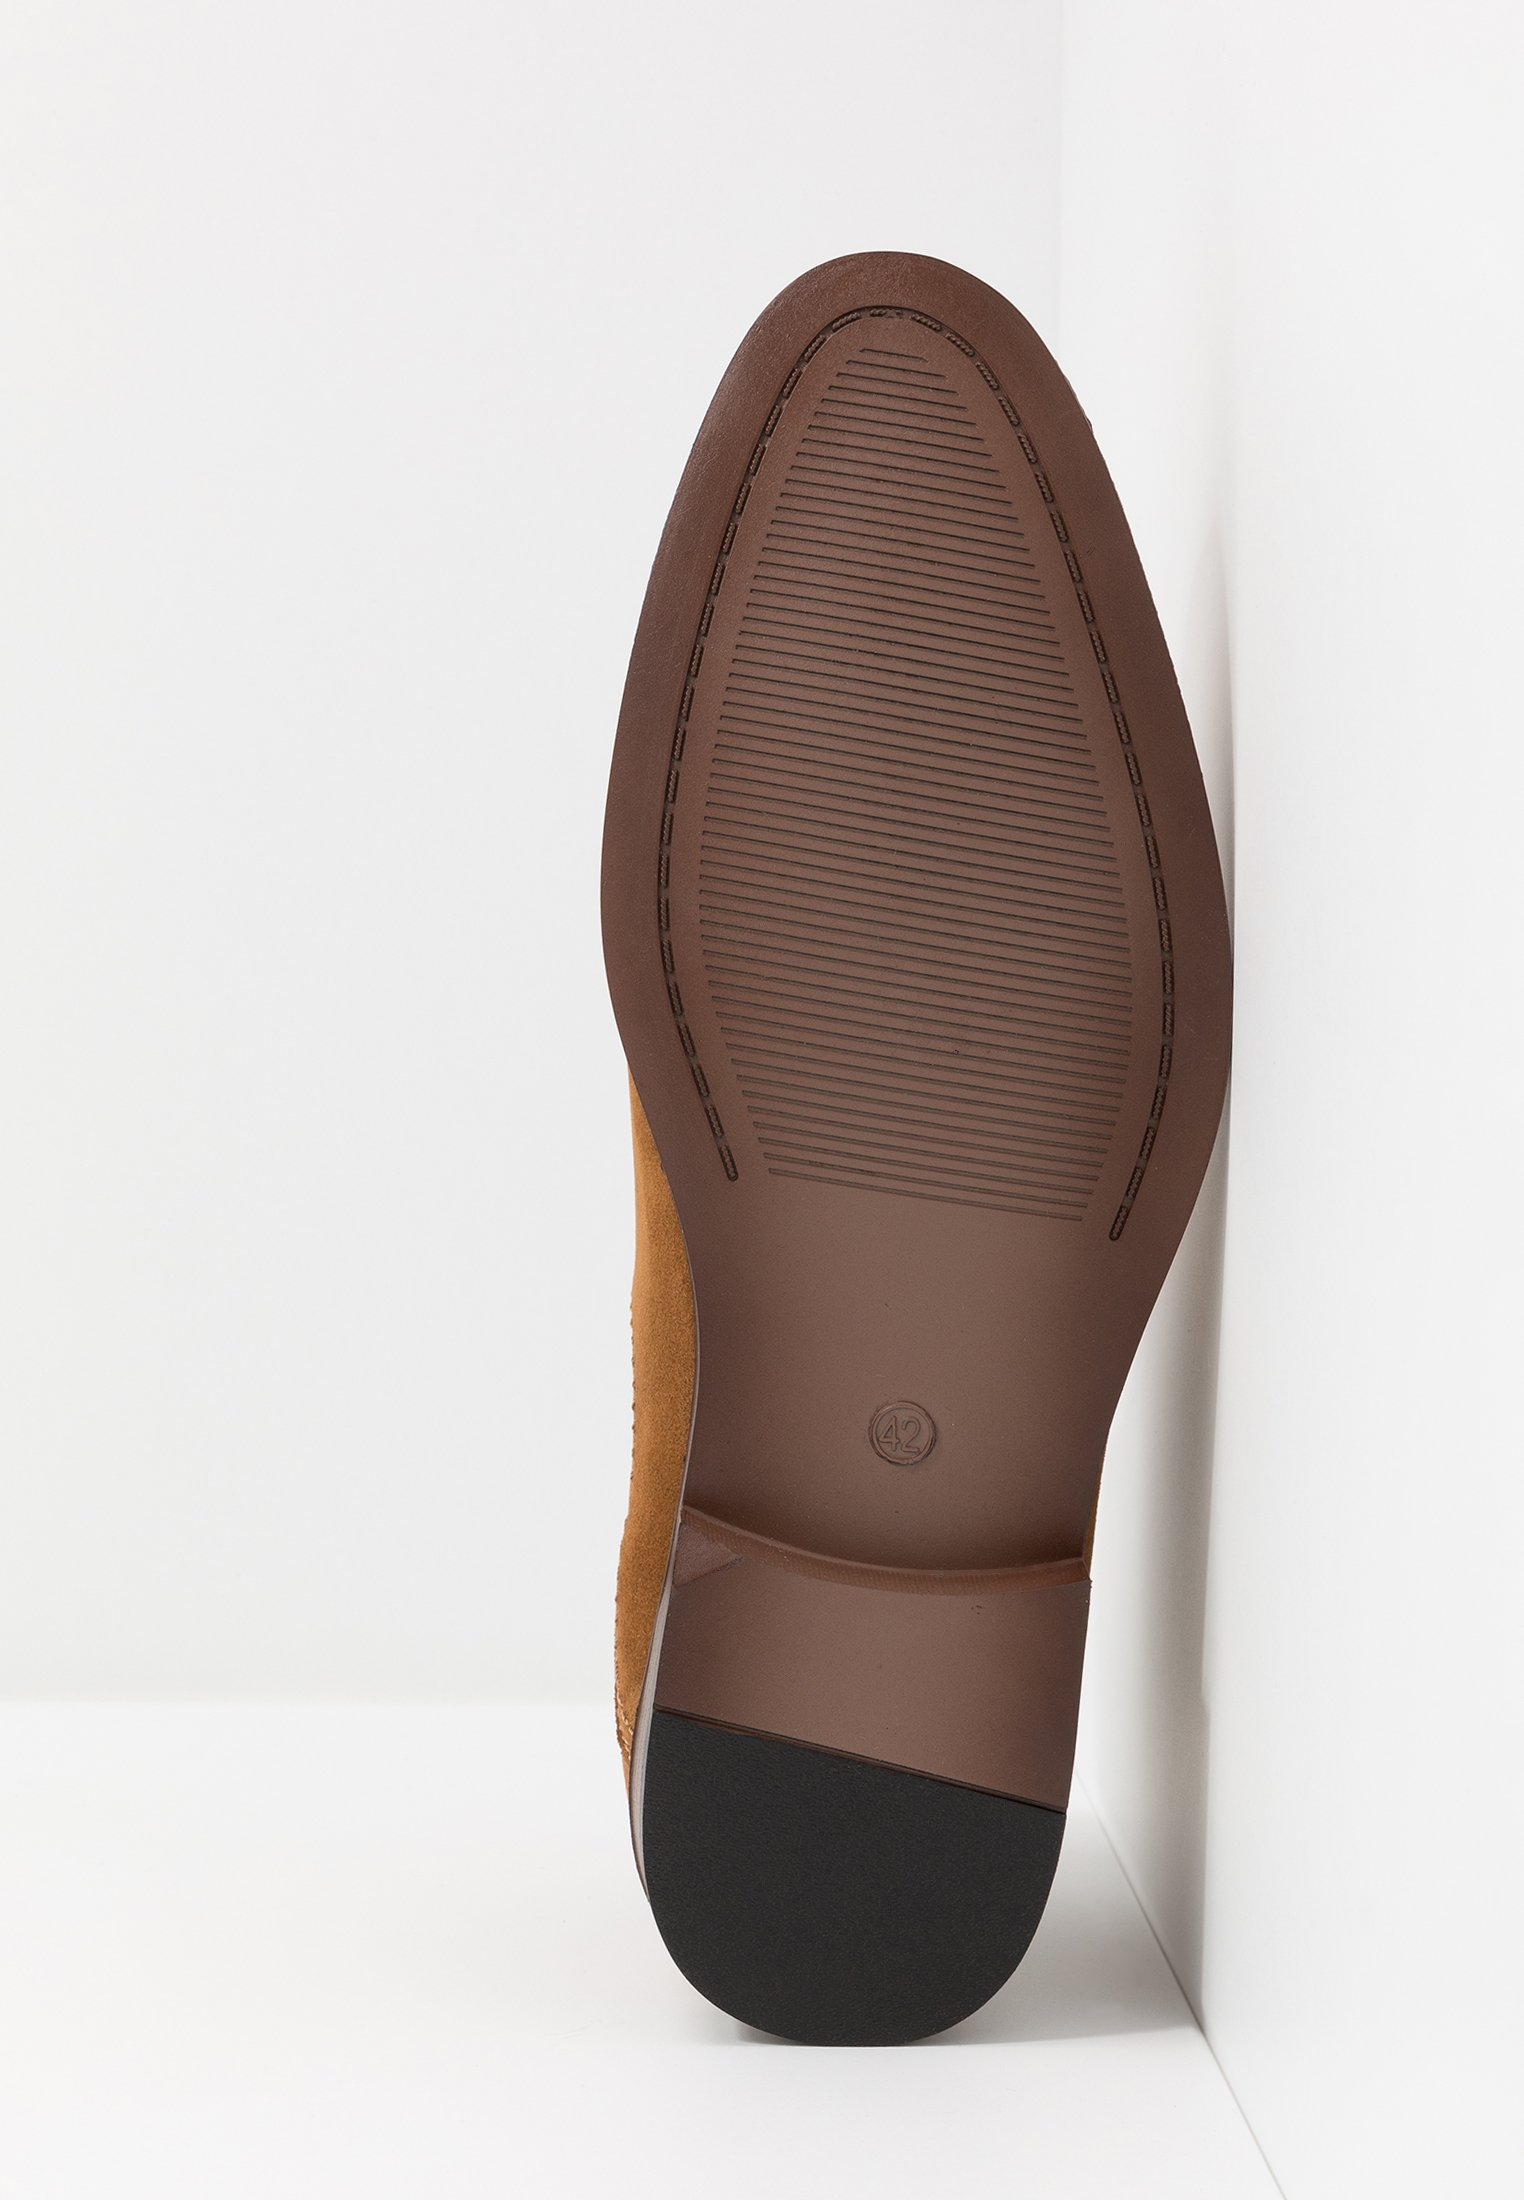 Pier One Stiefelette - brown - Black Friday